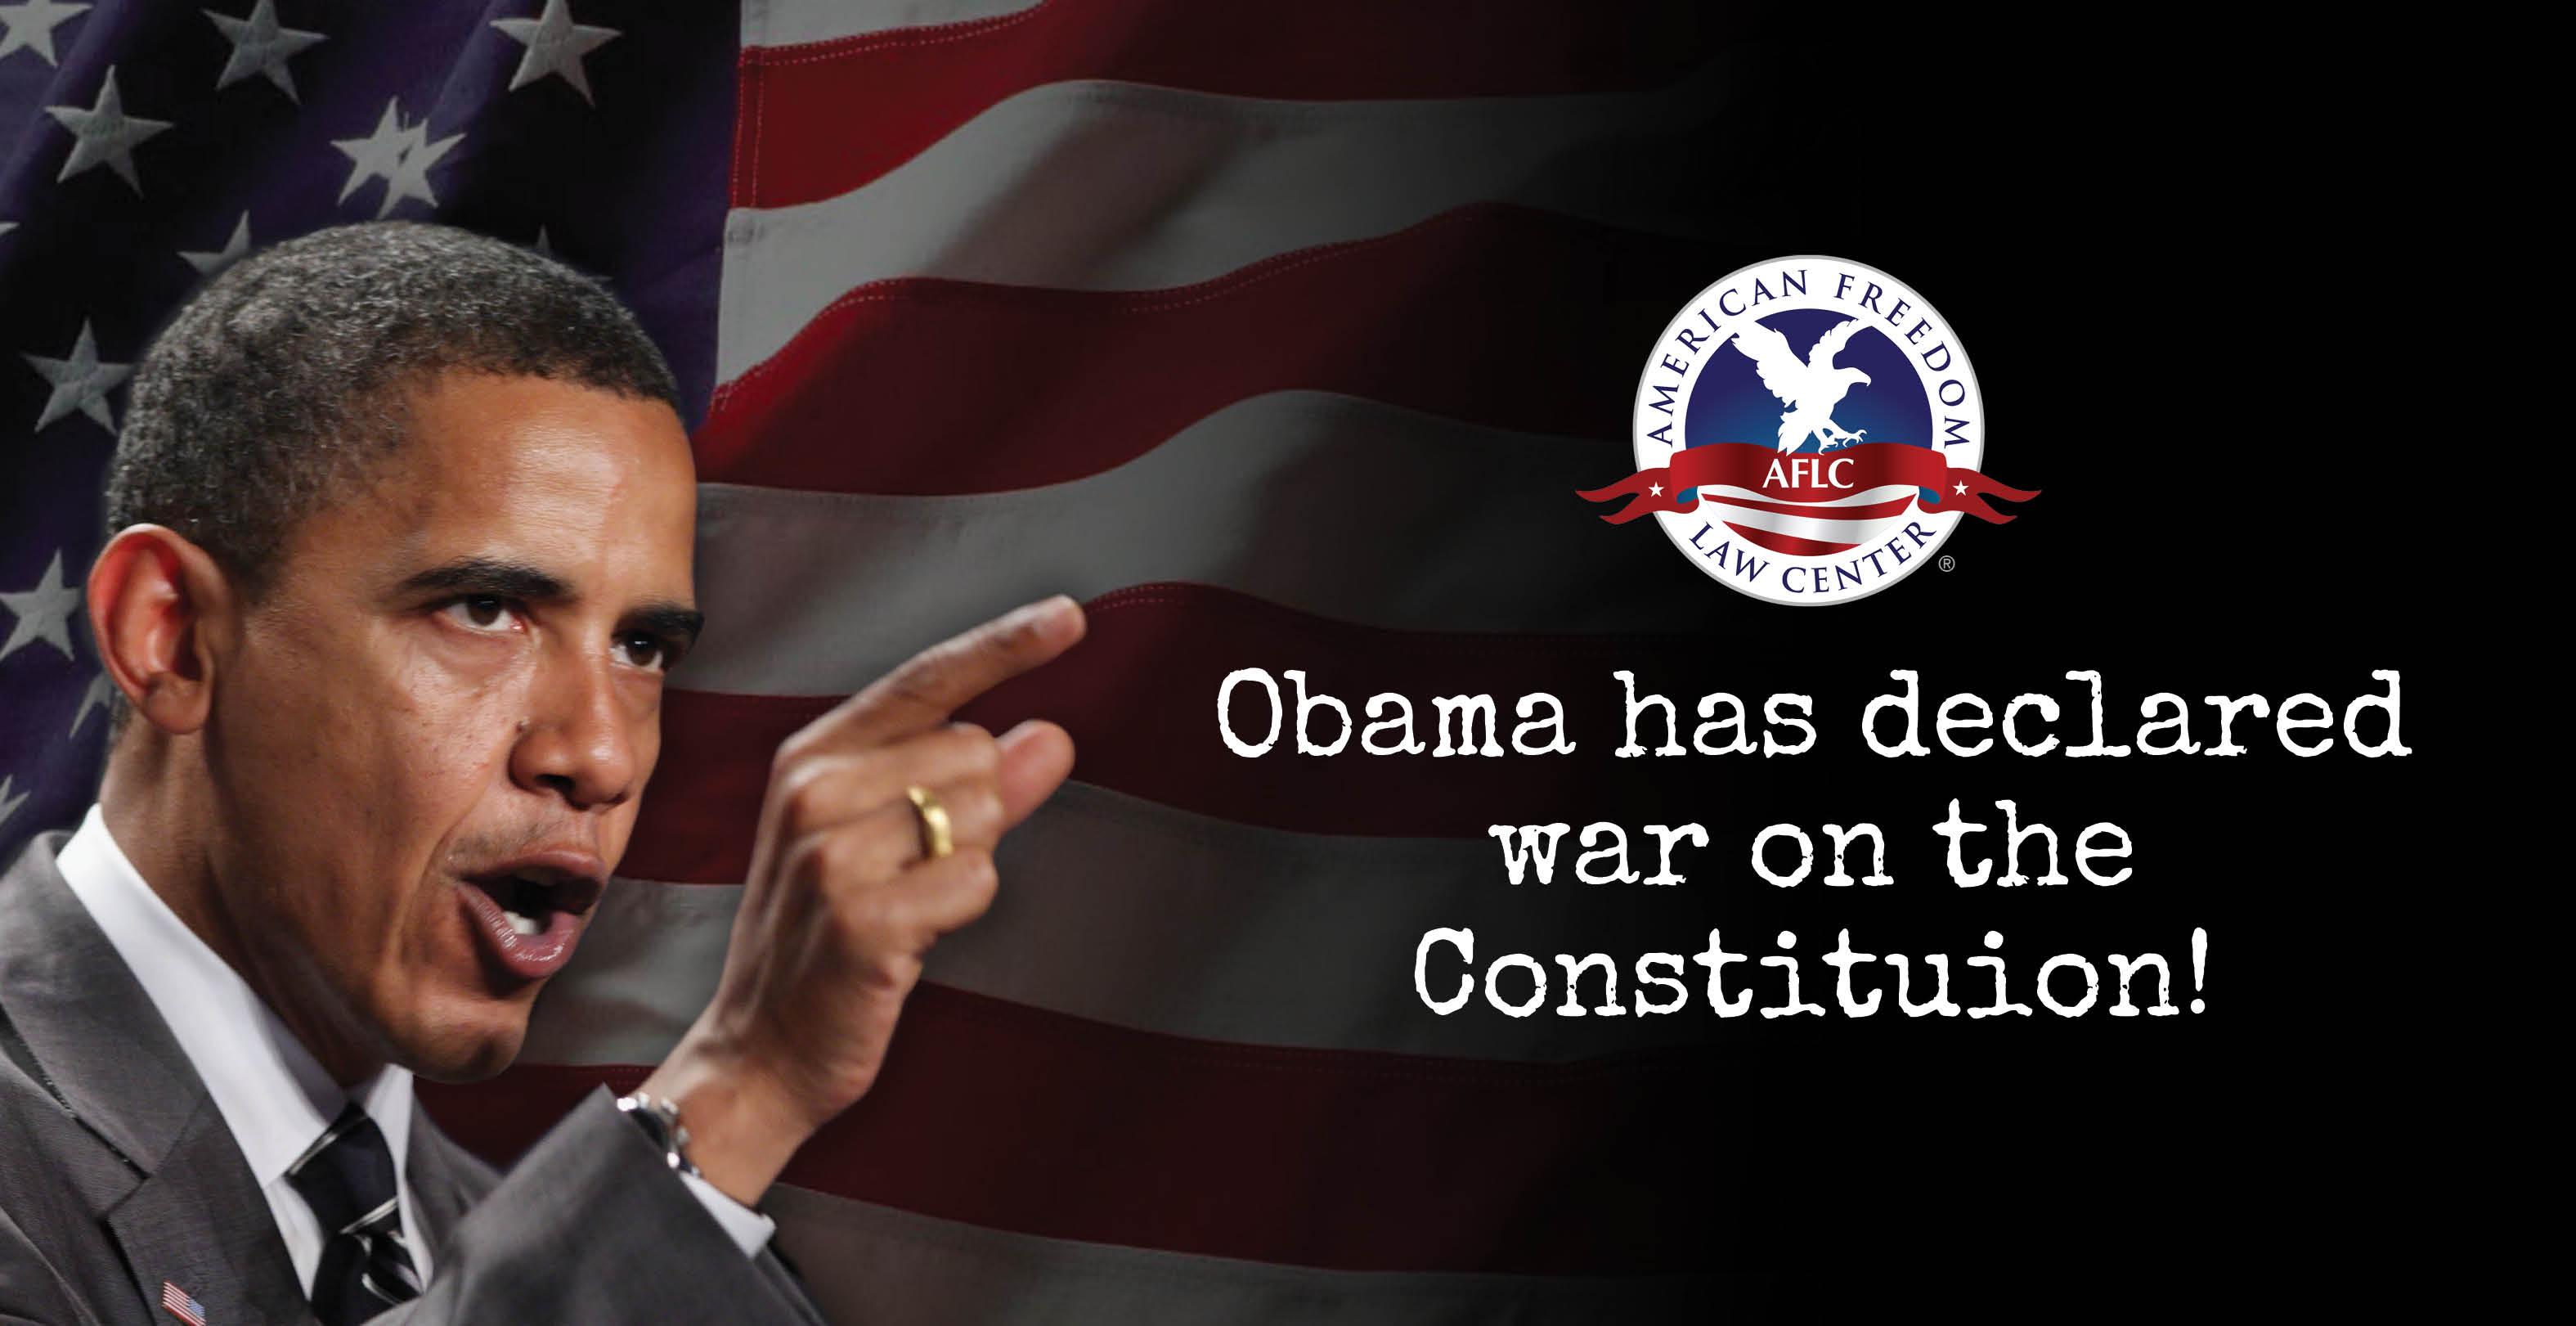 AFLC Sues Obama